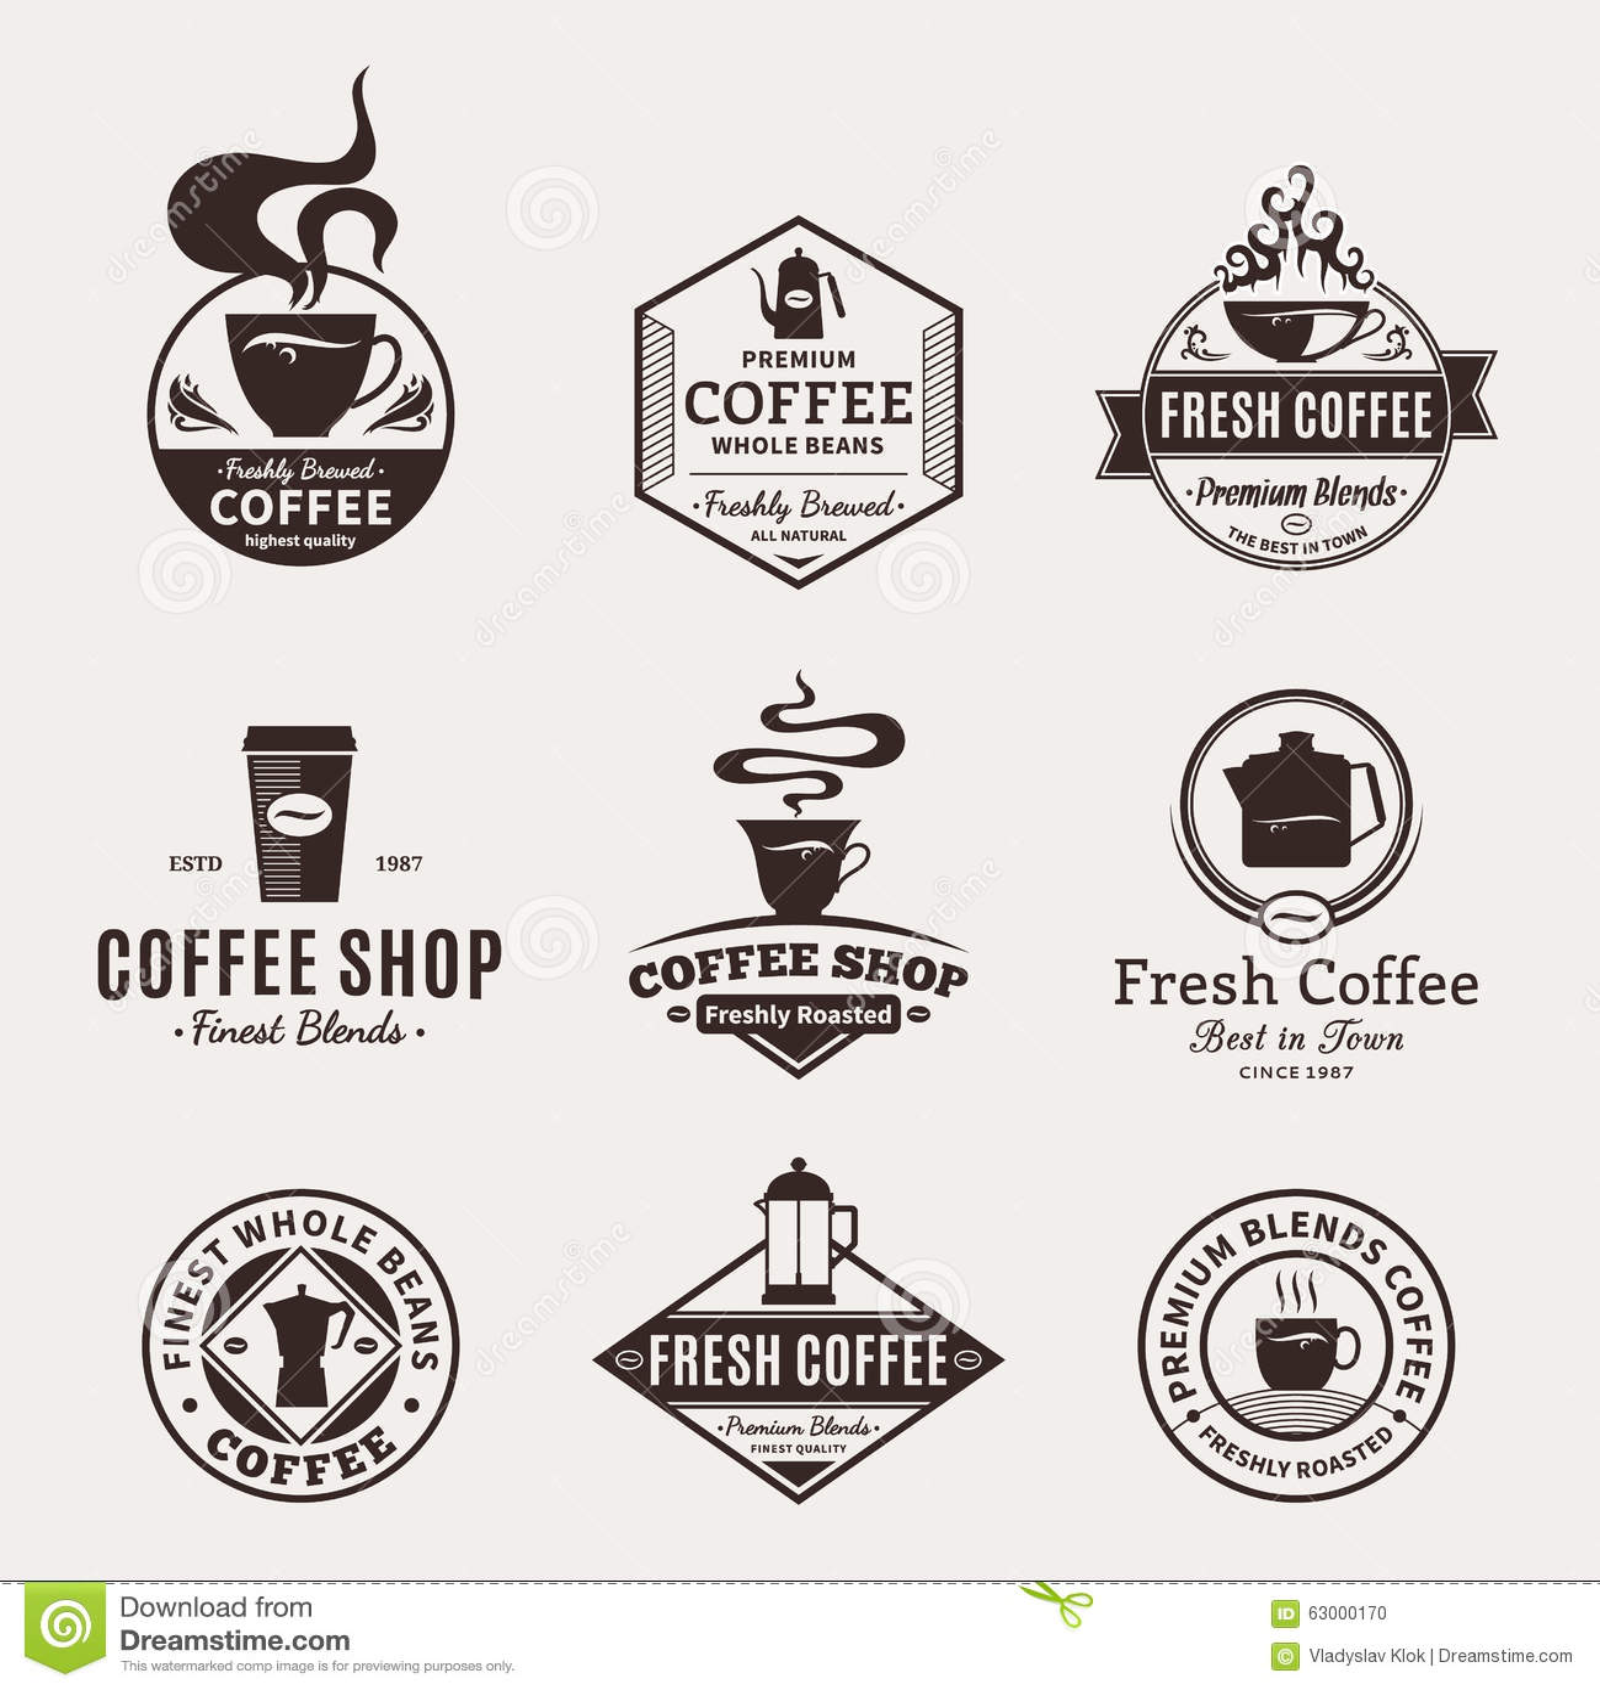 Art logo logo s coffee logo coffee shop coffee design shop logo coffee - Bar Coffee Coffeehouse Design Espresso Restaurant Set Shop